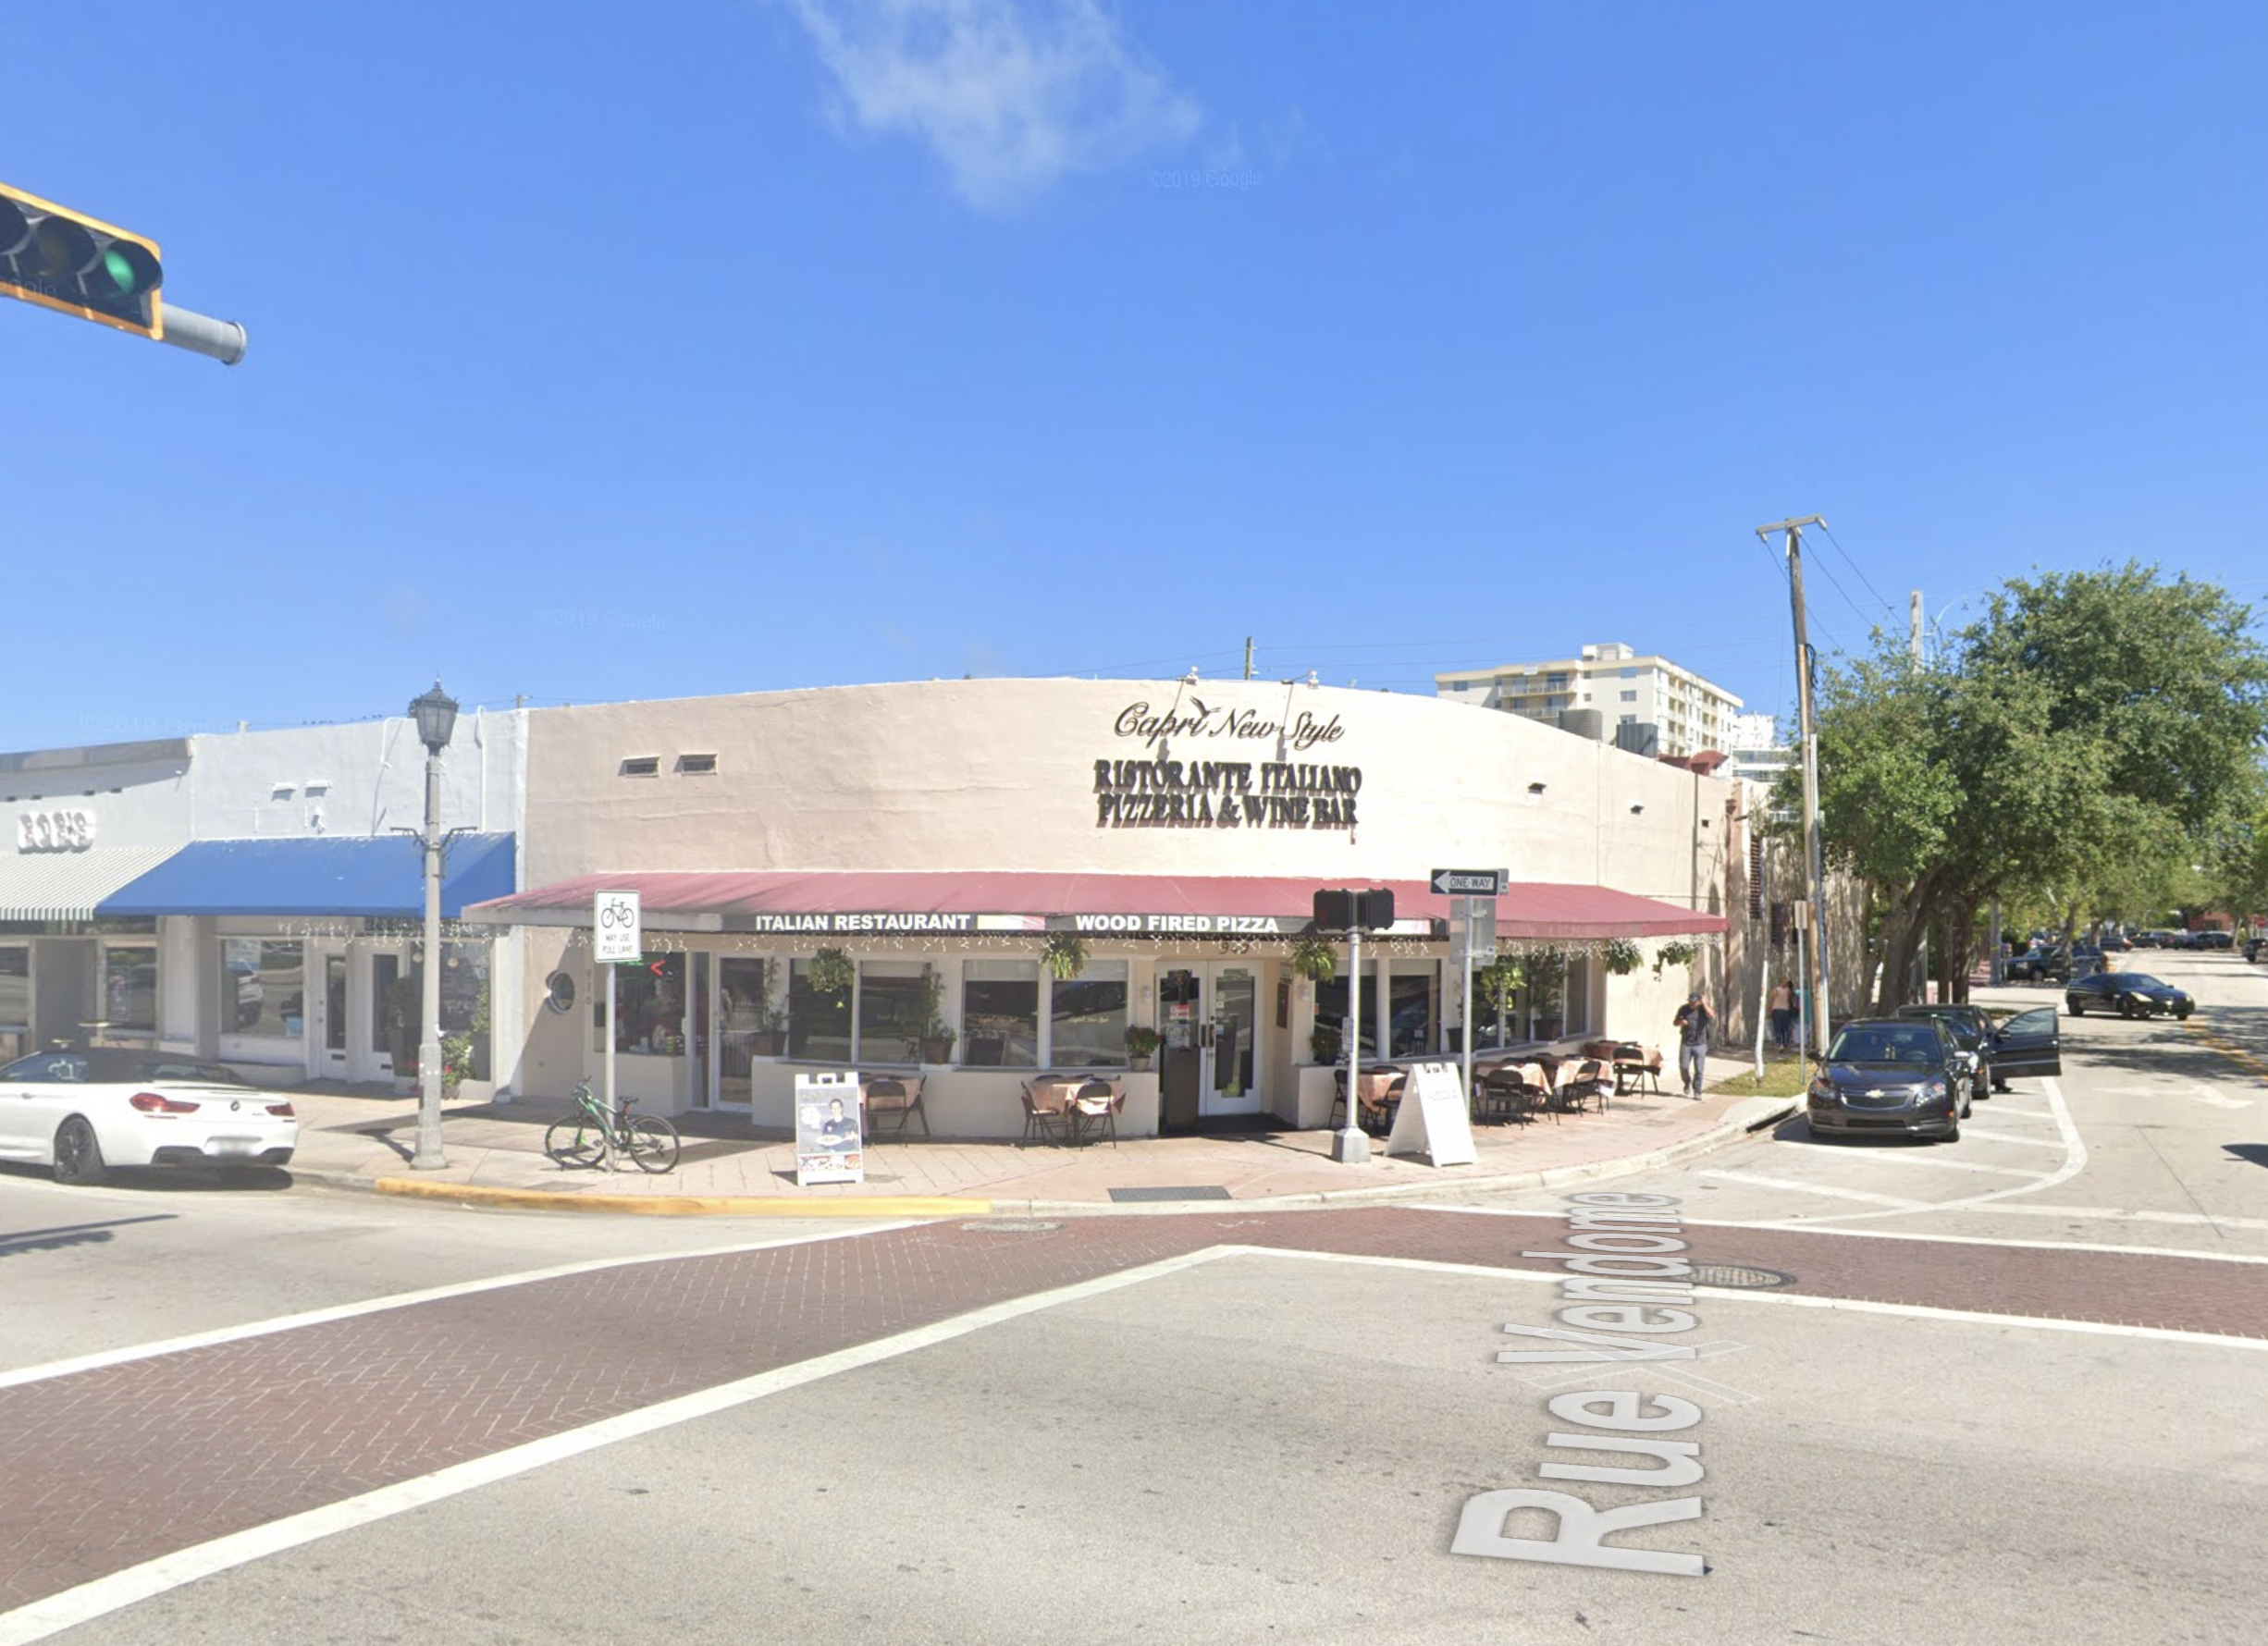 940 71st Street. Courtesy of Google Maps.